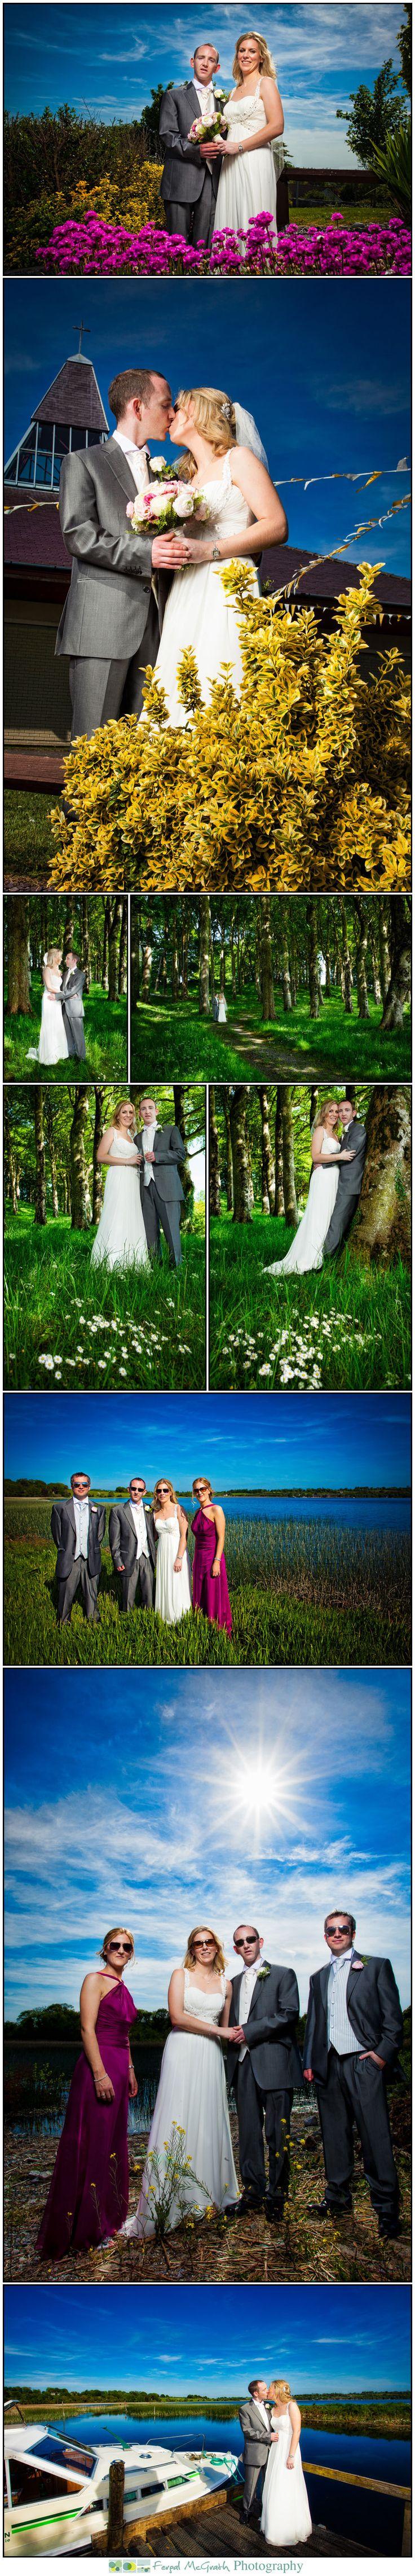 Sueno hotel atlantic golf holidays atlantic golf holidays - Glasson Golf Hotel Athlone Weddings